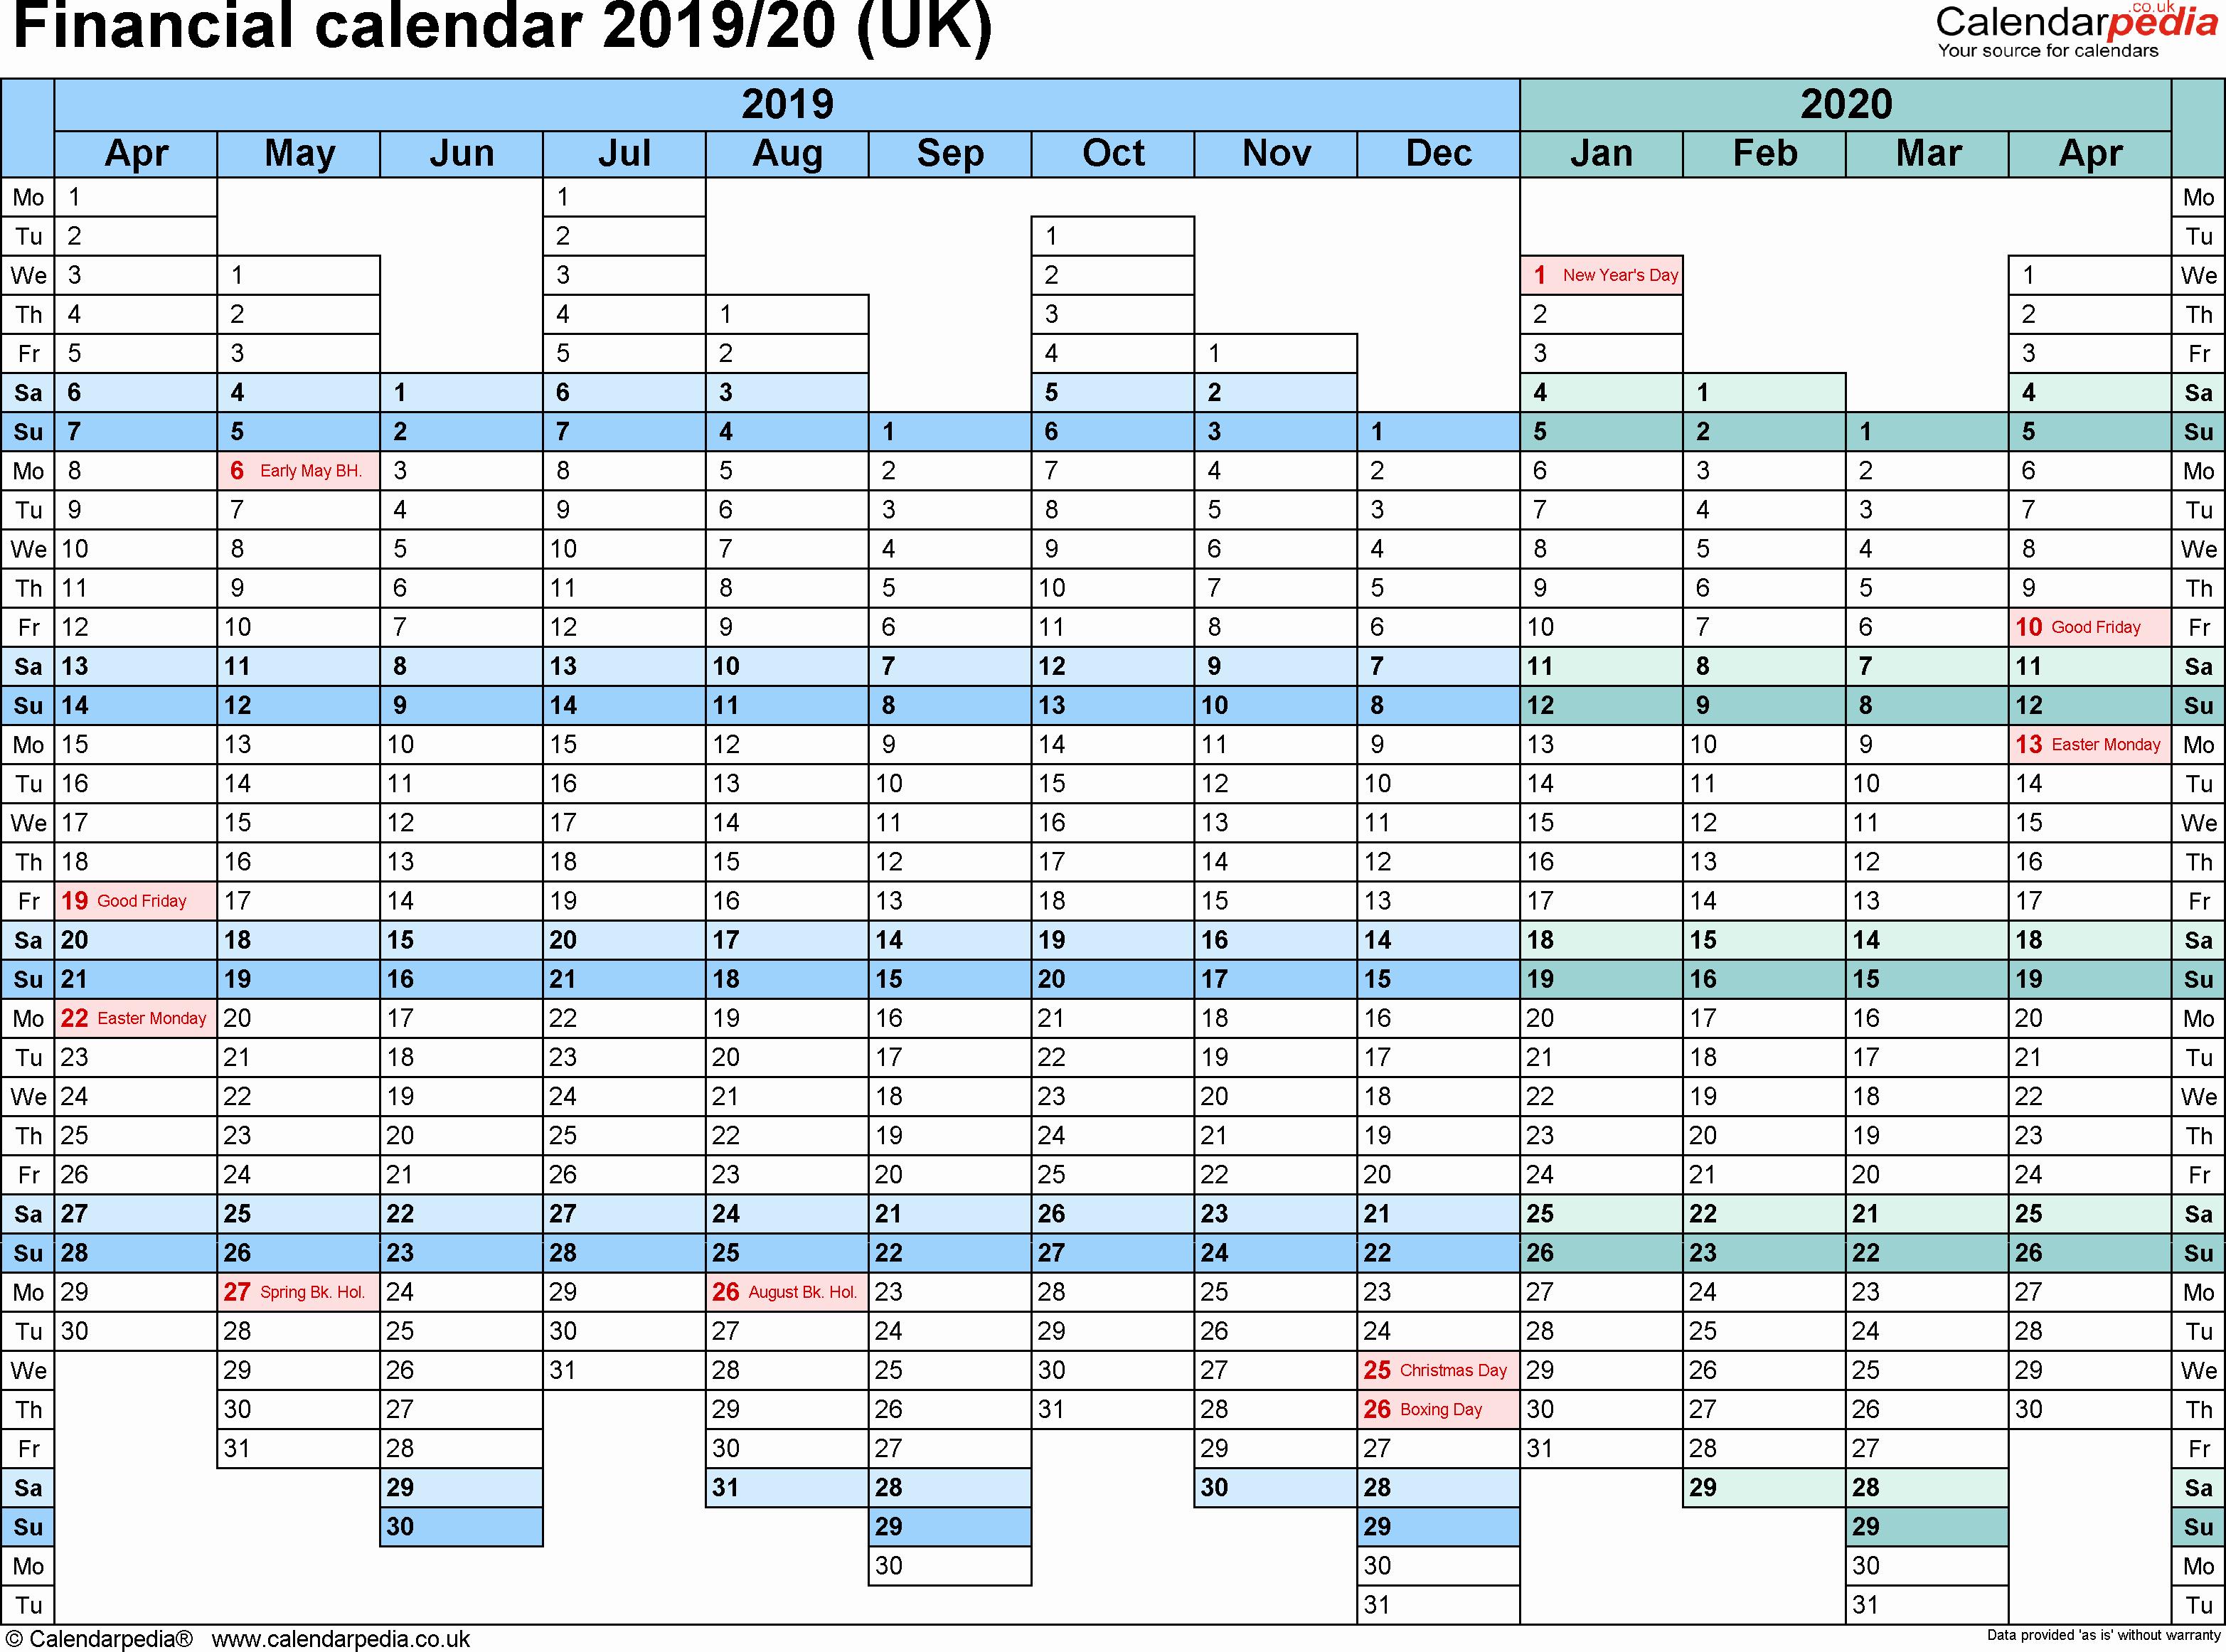 2019 and 2020 Calendar Printable Beautiful Financial Calendars 2019 20 Uk In Microsoft Excel format